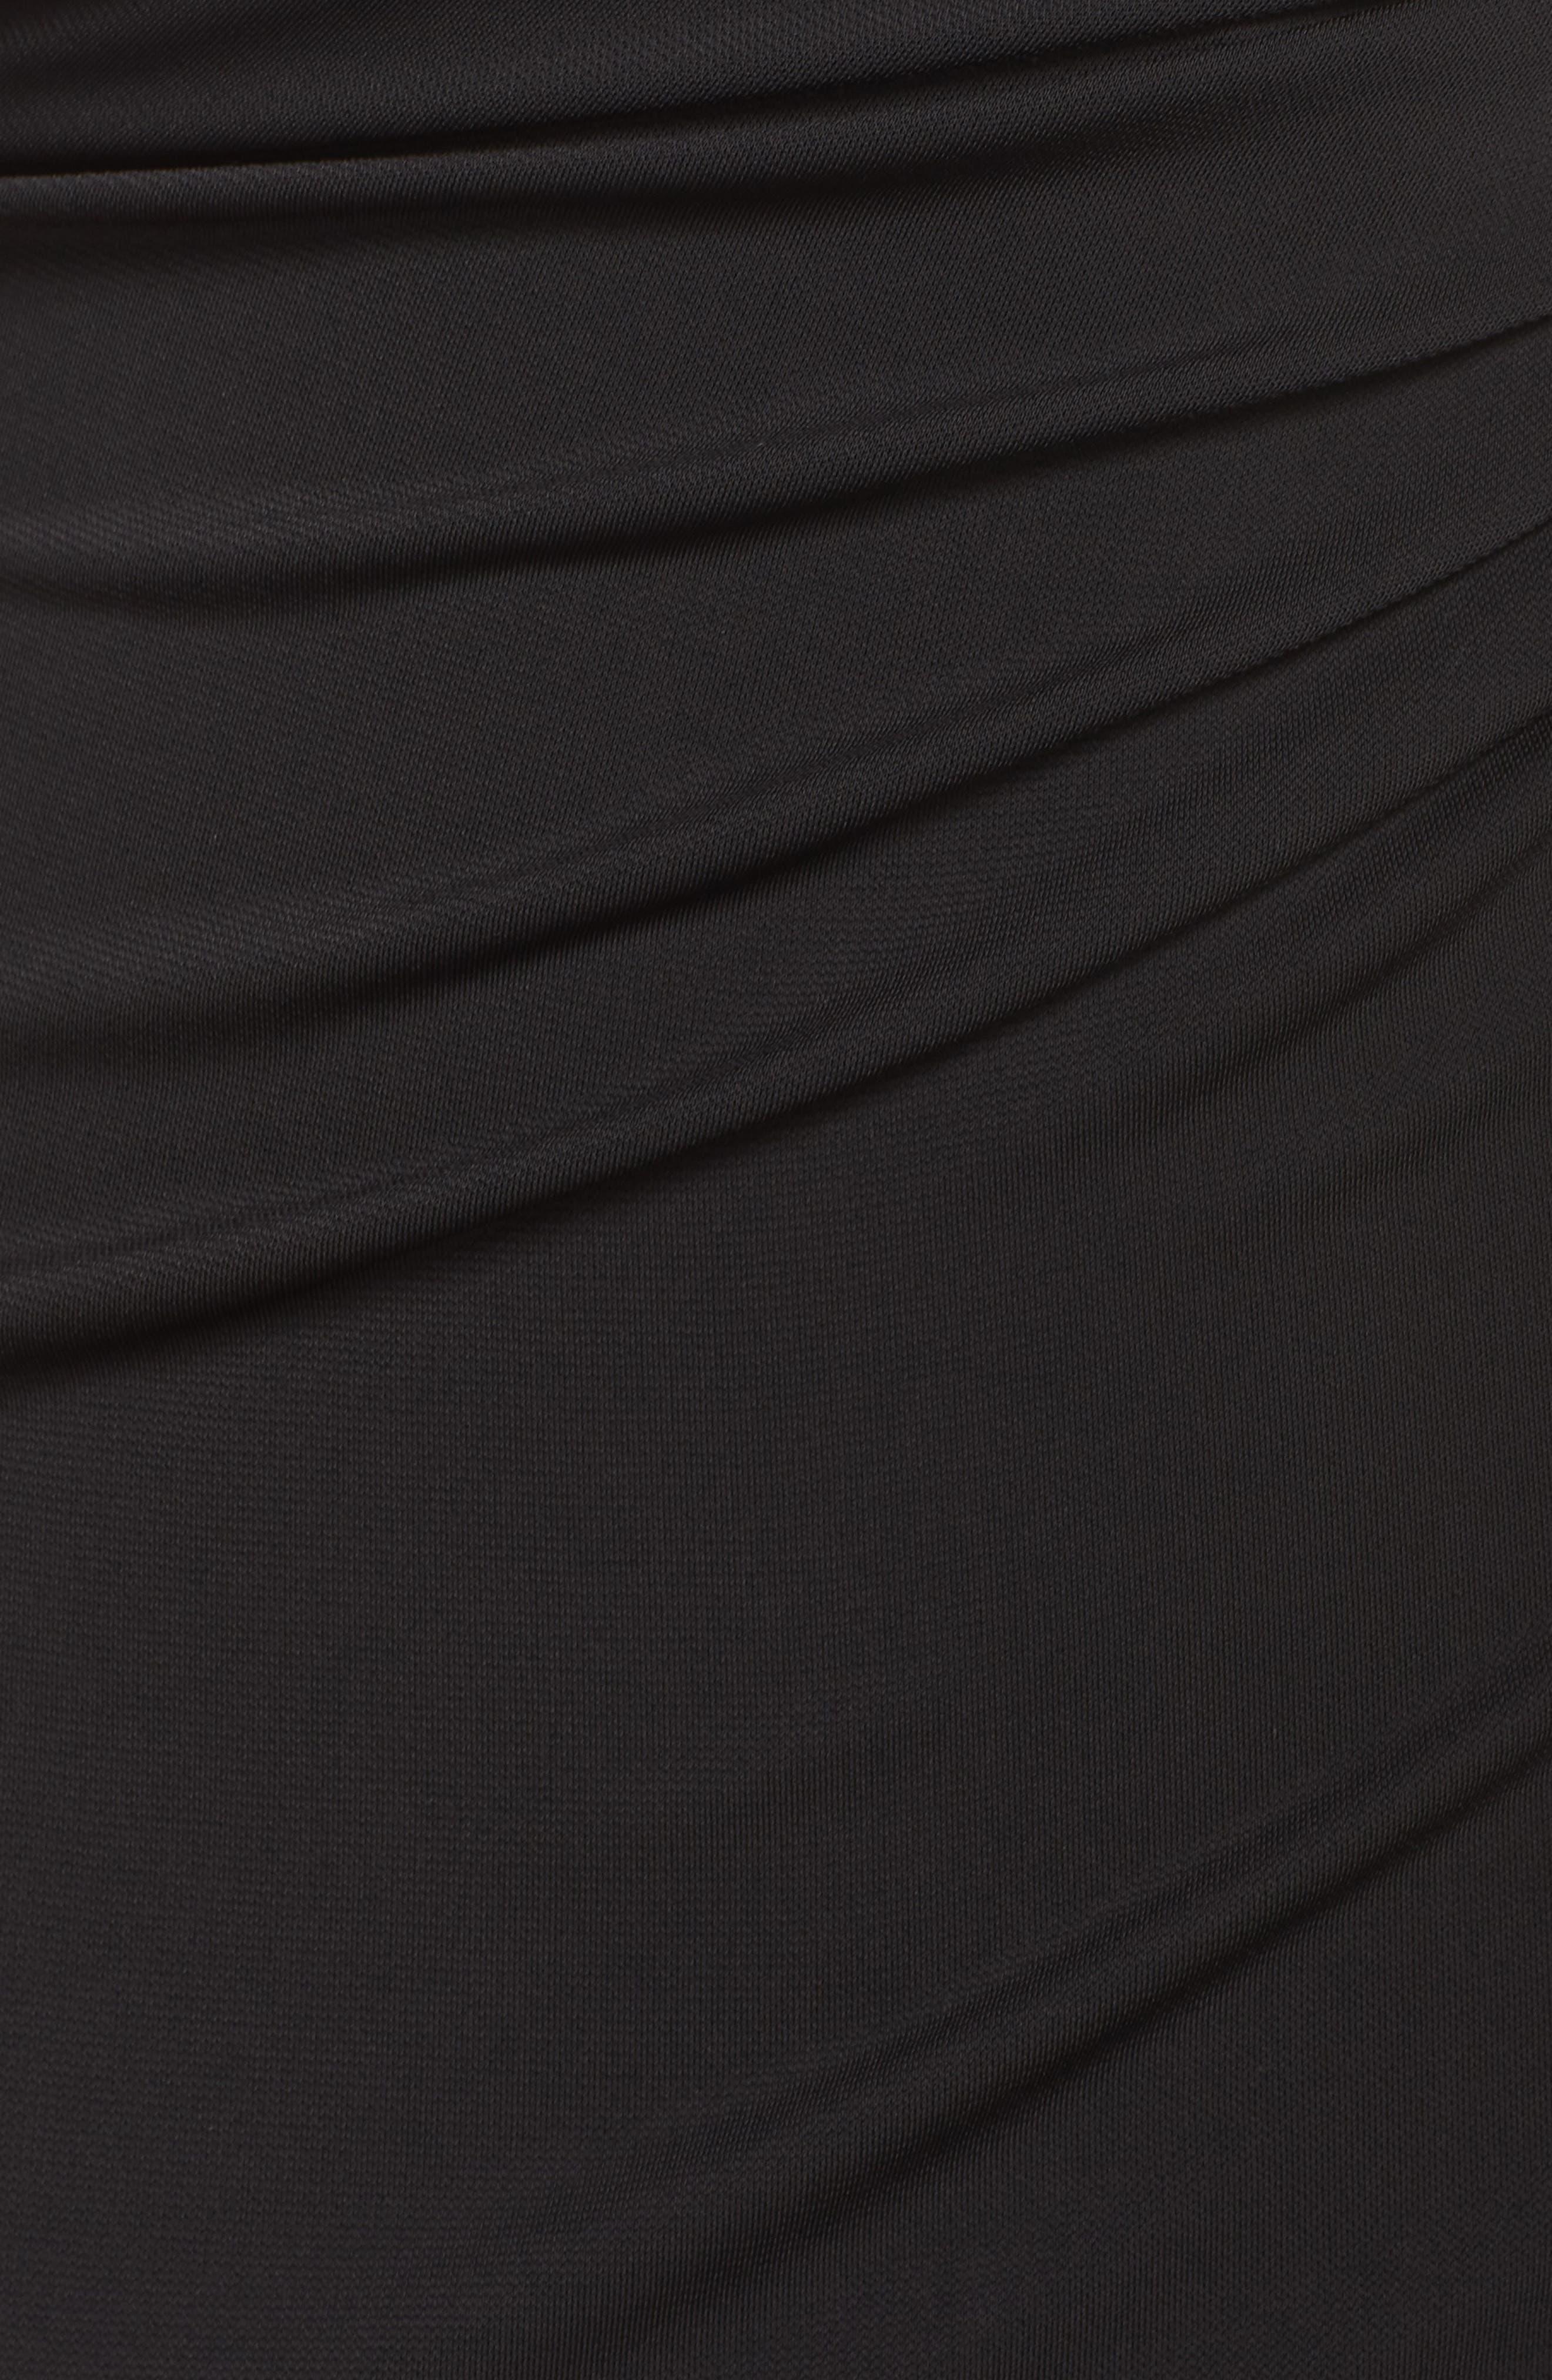 Kerri One-Shoulder Gown,                             Alternate thumbnail 5, color,                             Black